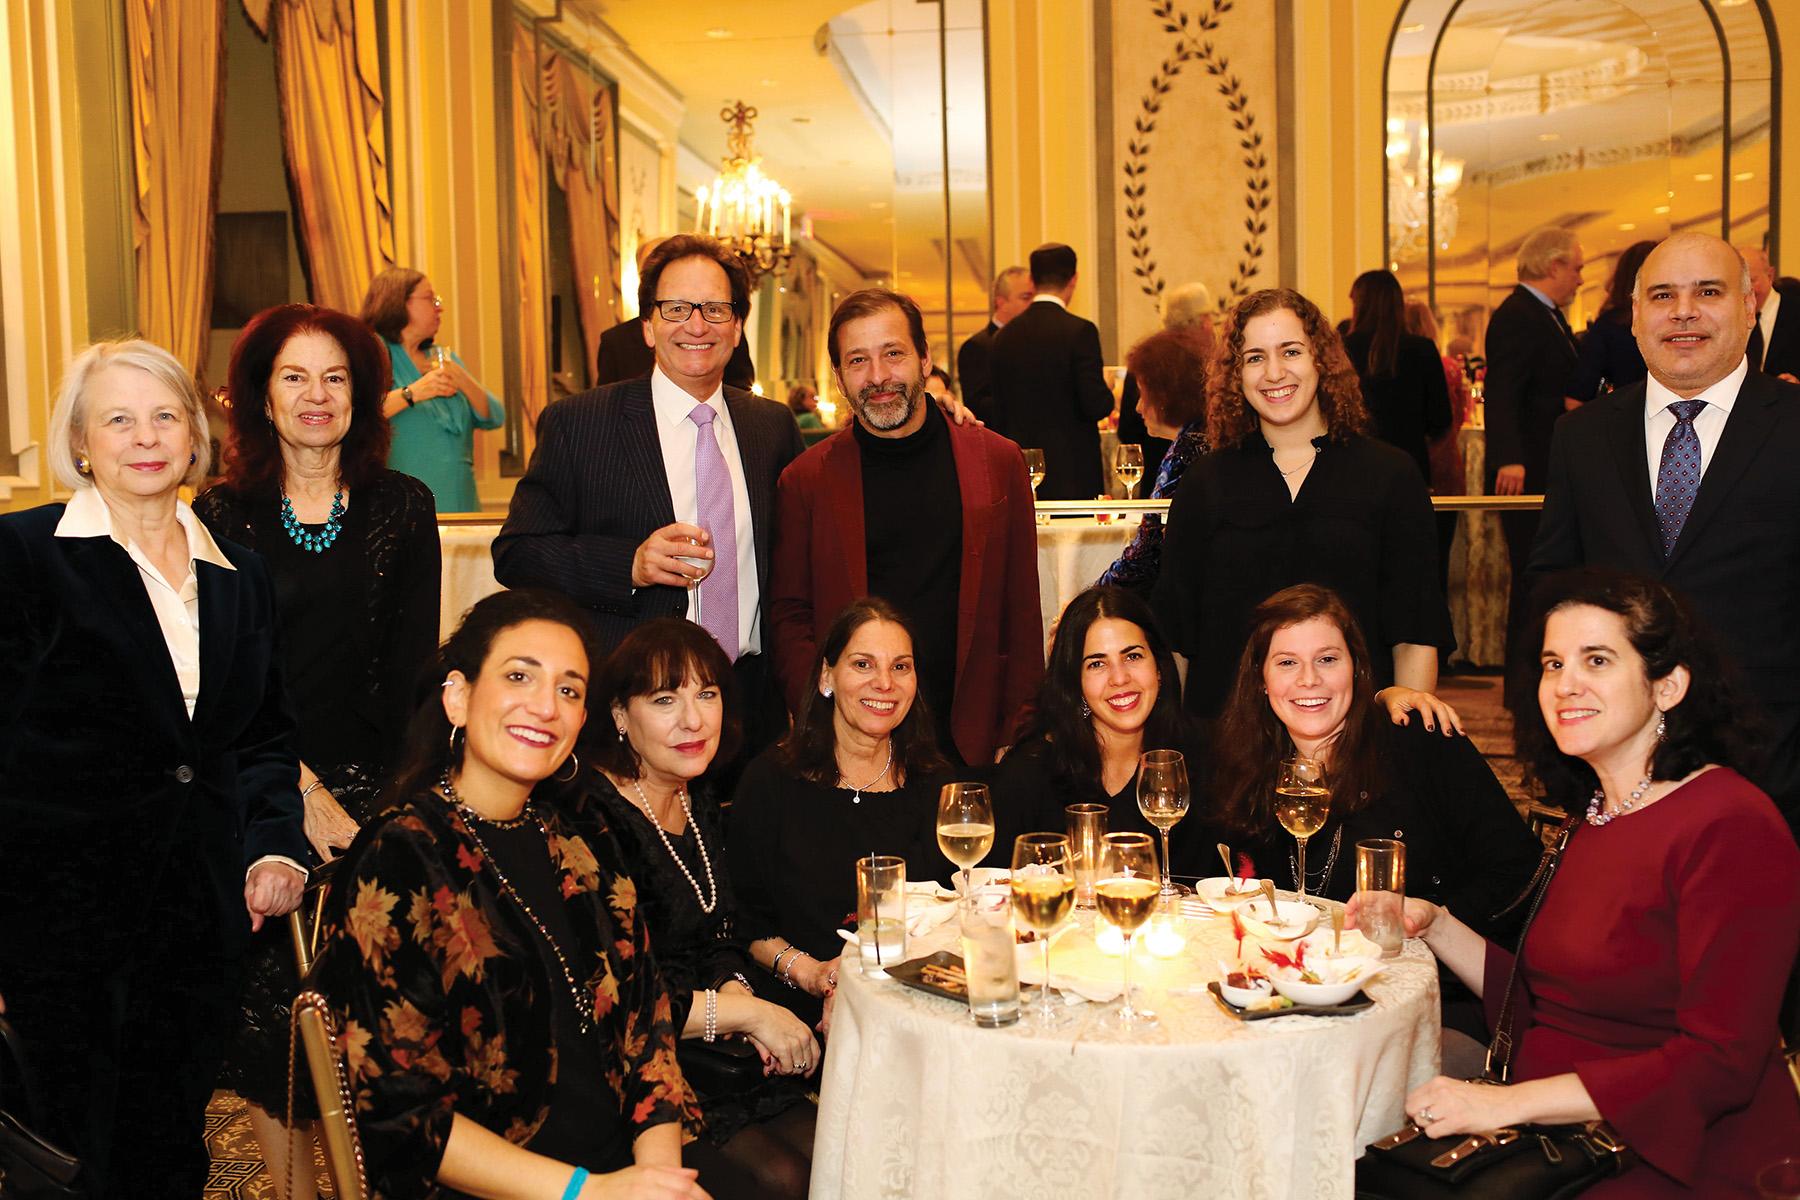 New Editor Named For Jewish Week | Jewish Week